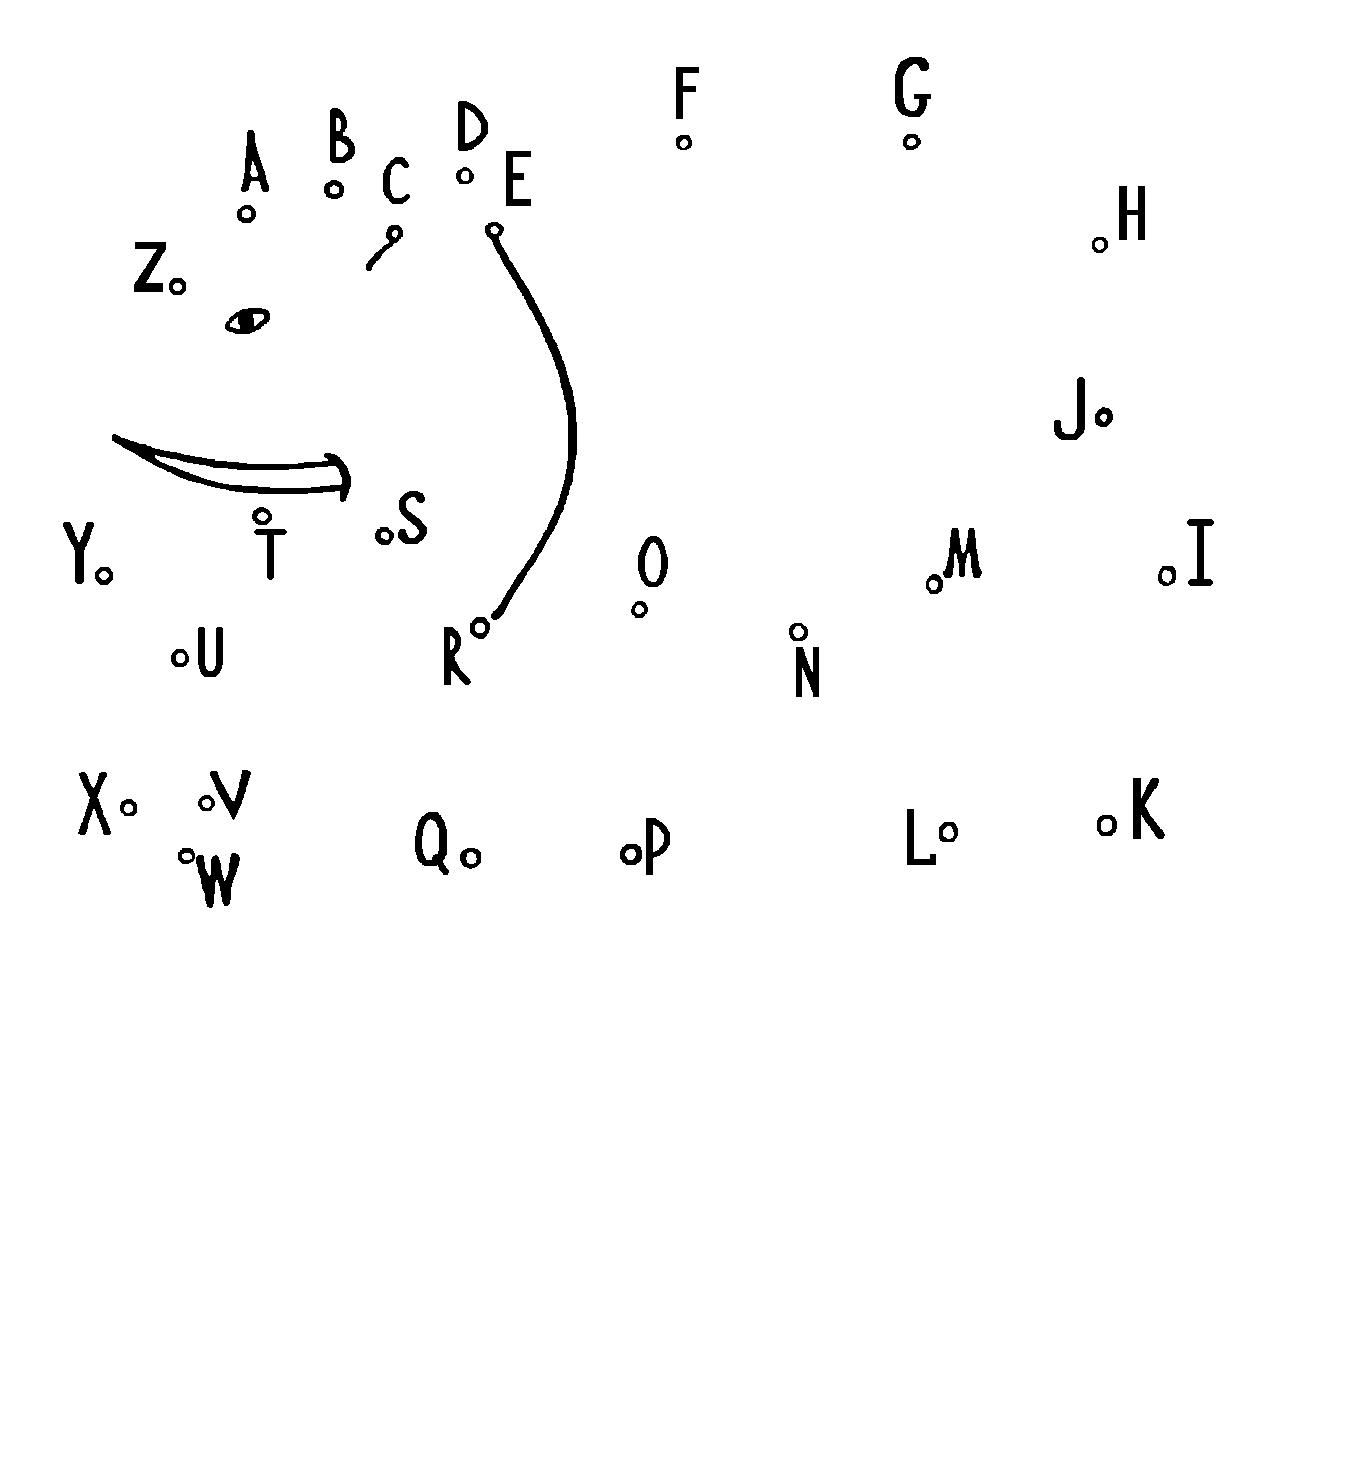 картинки по точкам по английскому алфавиту